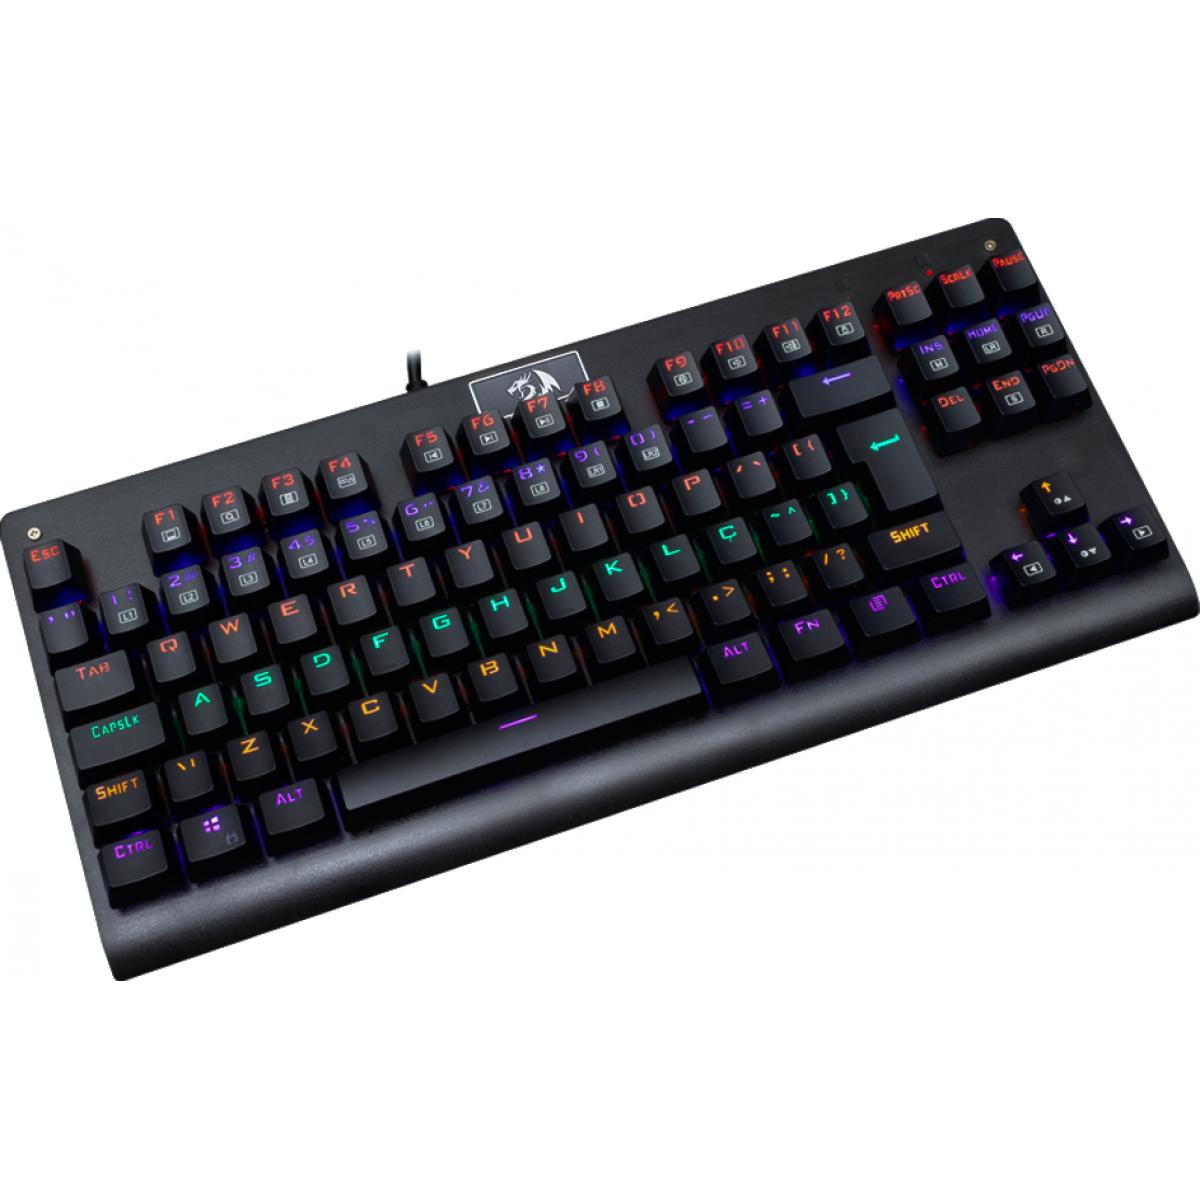 Teclado Mecânico Gamer Redragon Dark Avenger K568 Rainbow, Switch Brown, ABNT2, Black